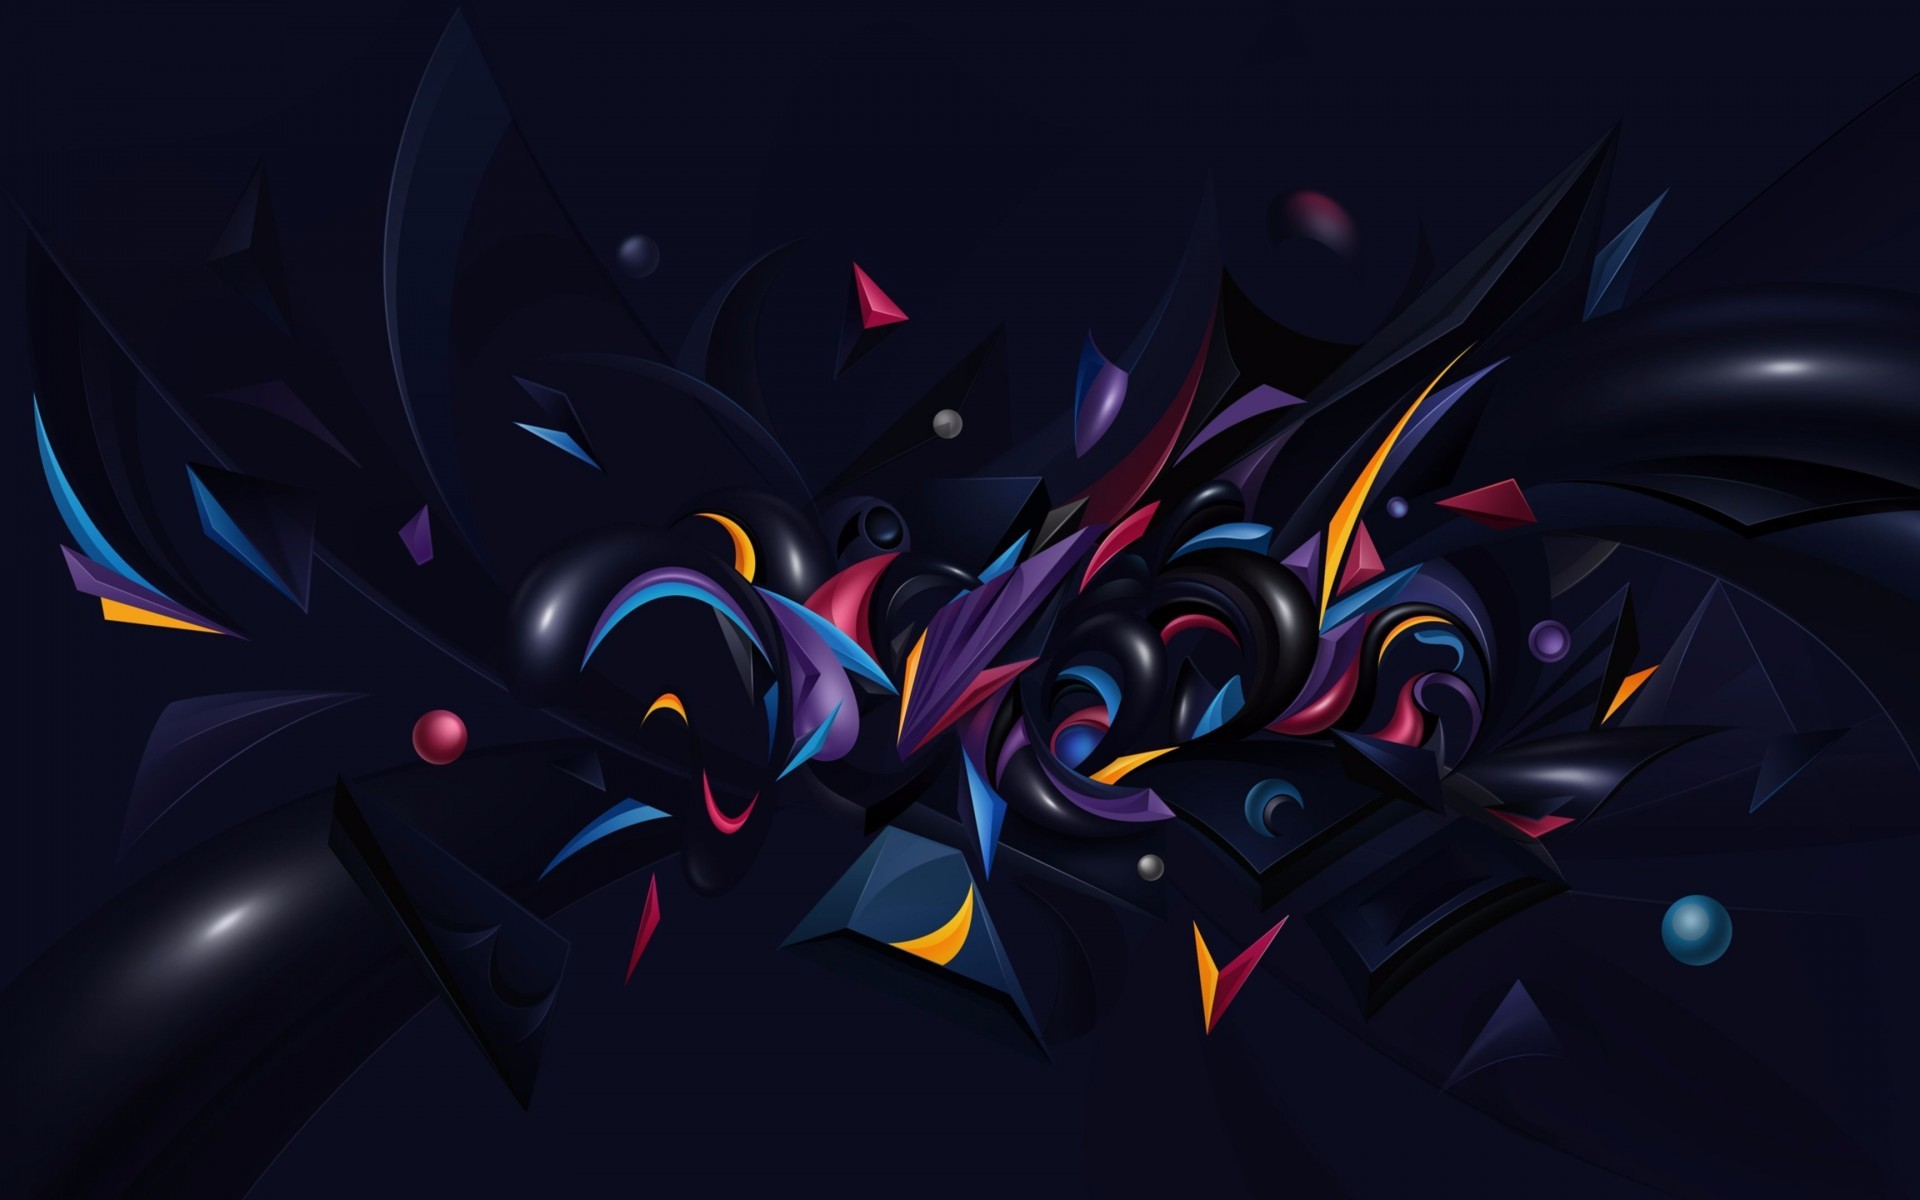 3600x2025 Noisy Hd 5k 4k Wallpaper Abstract